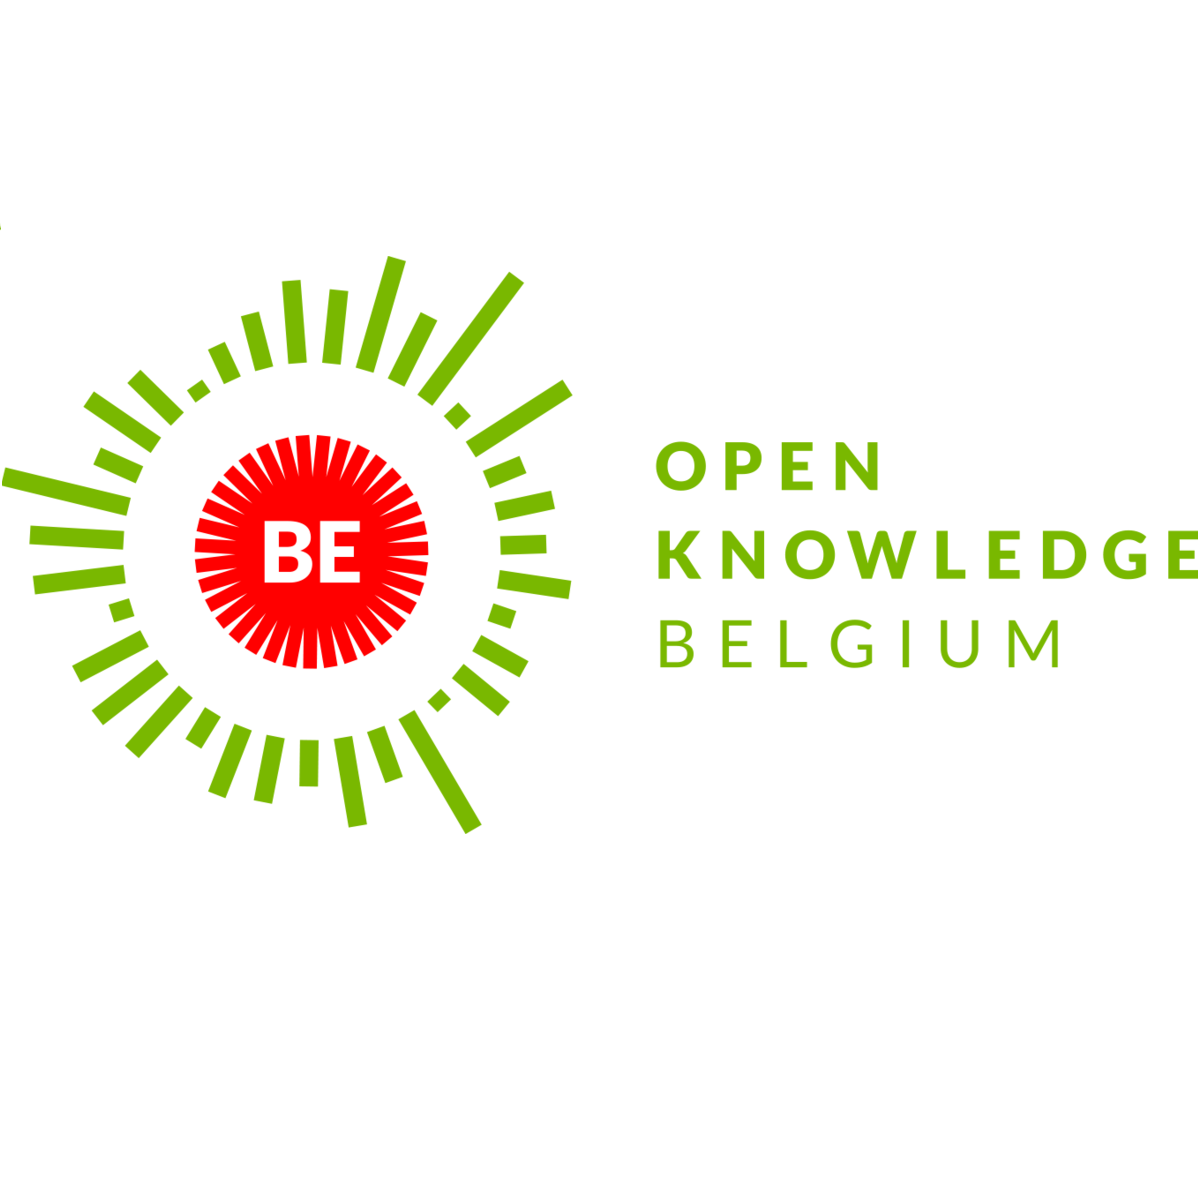 Open knowledge Belgium